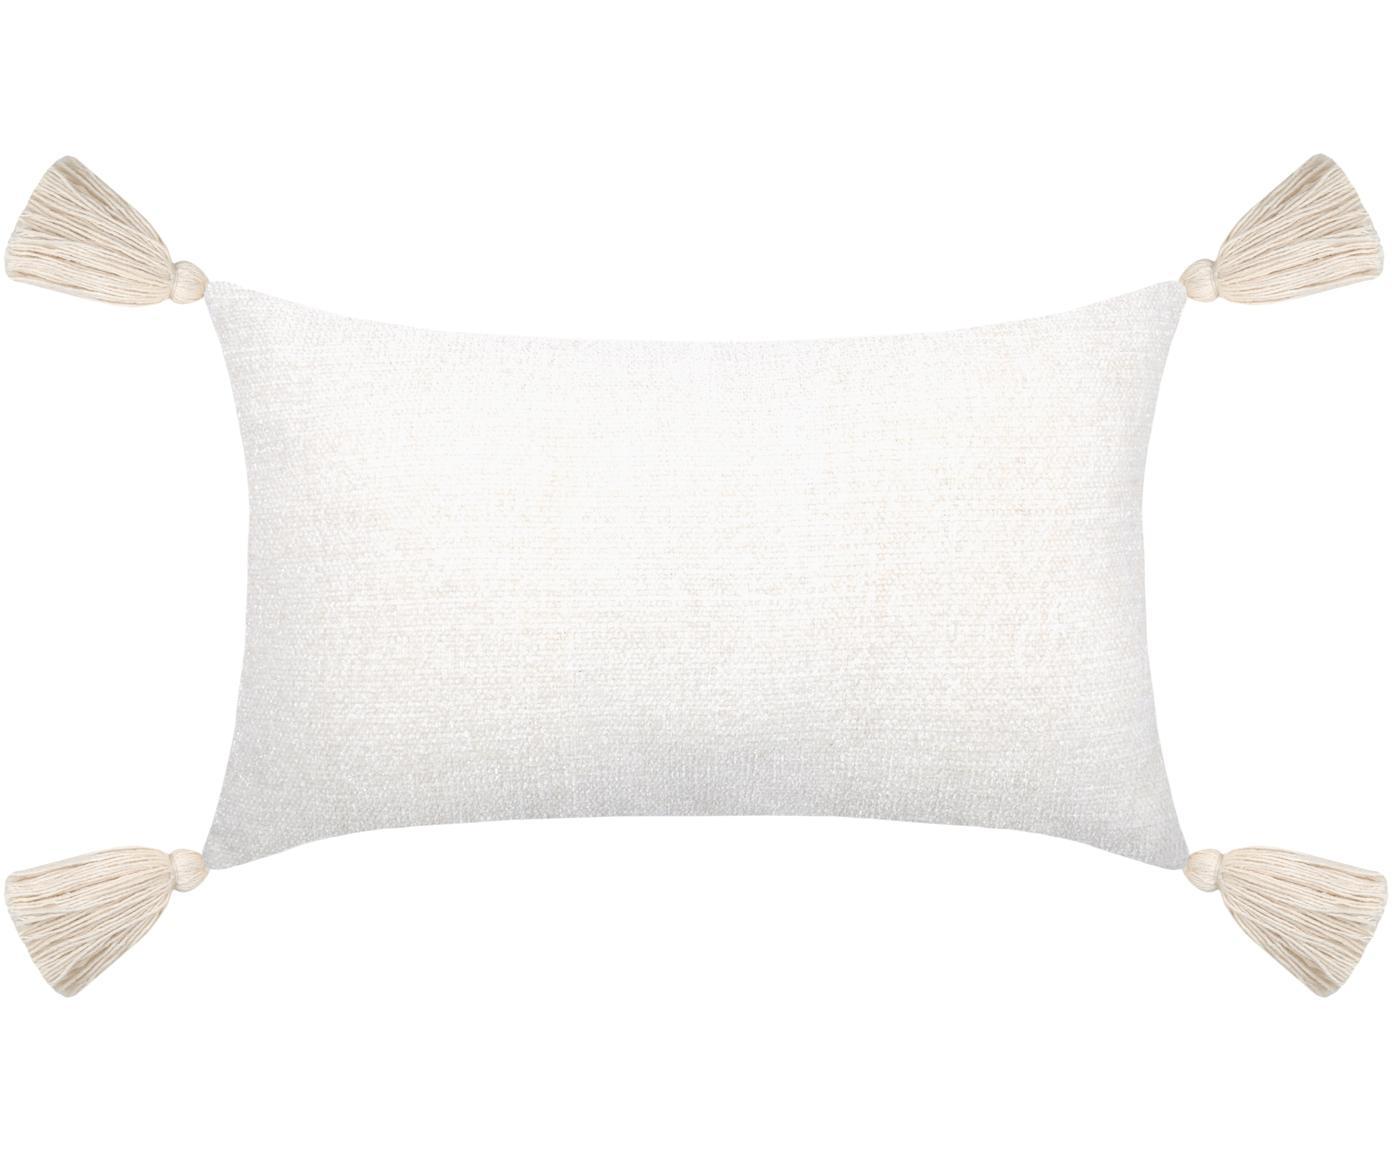 Kussen Chila, met vulling, Wit, 30 x 50 cm